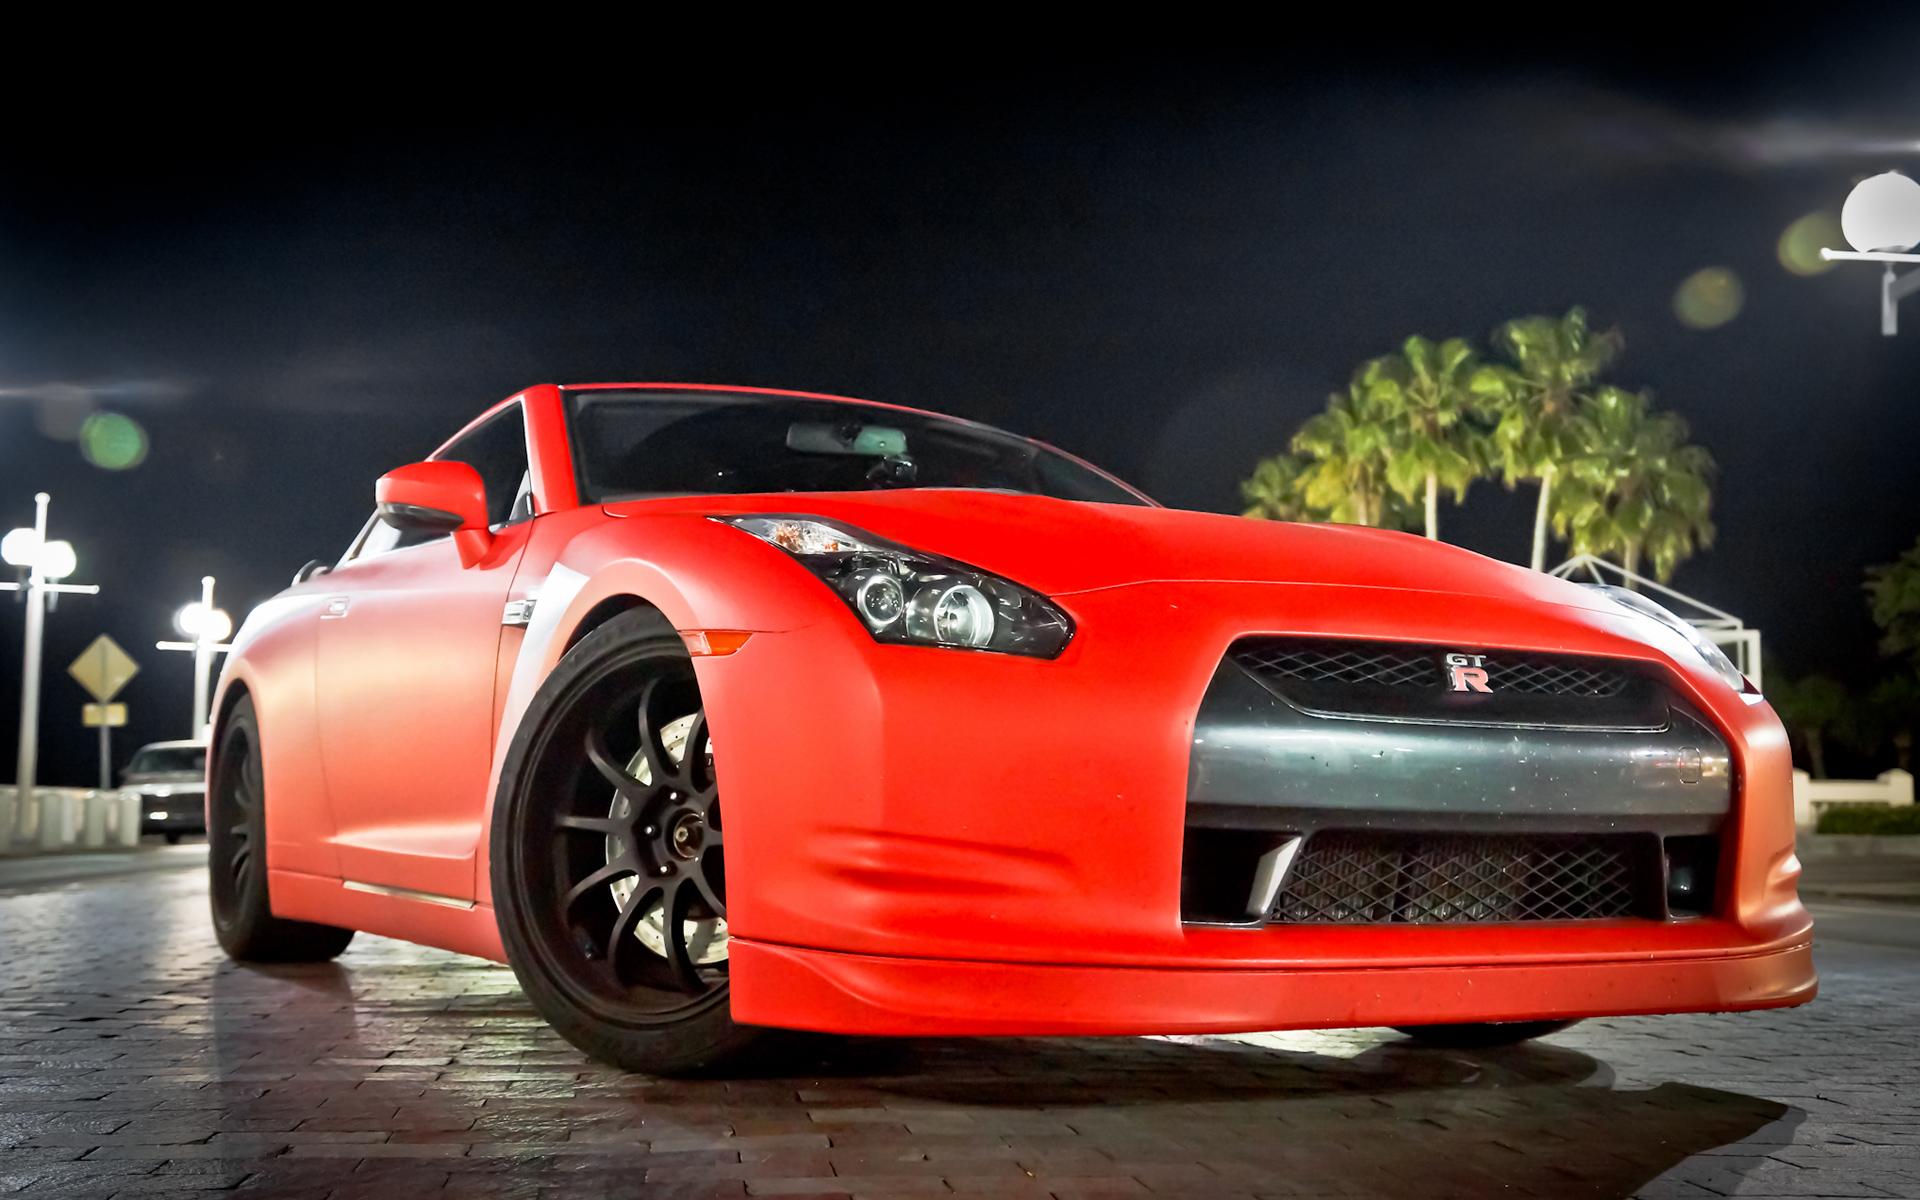 Nissan GTR Matte Red Wallpaper | HD Car Wallpapers | ID #2976